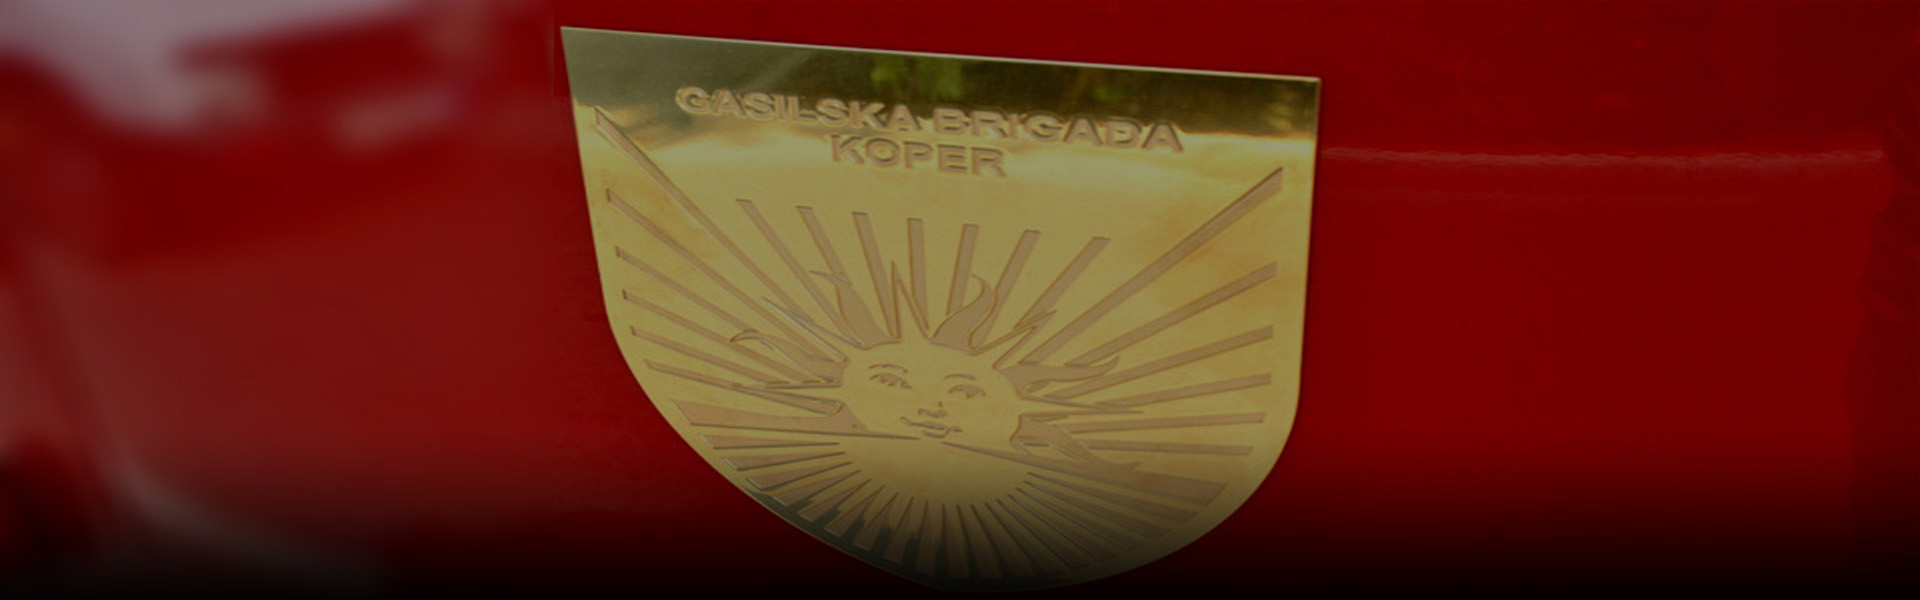 Razpis za direktorja – poveljnika JZ Gasilska brigada Koper